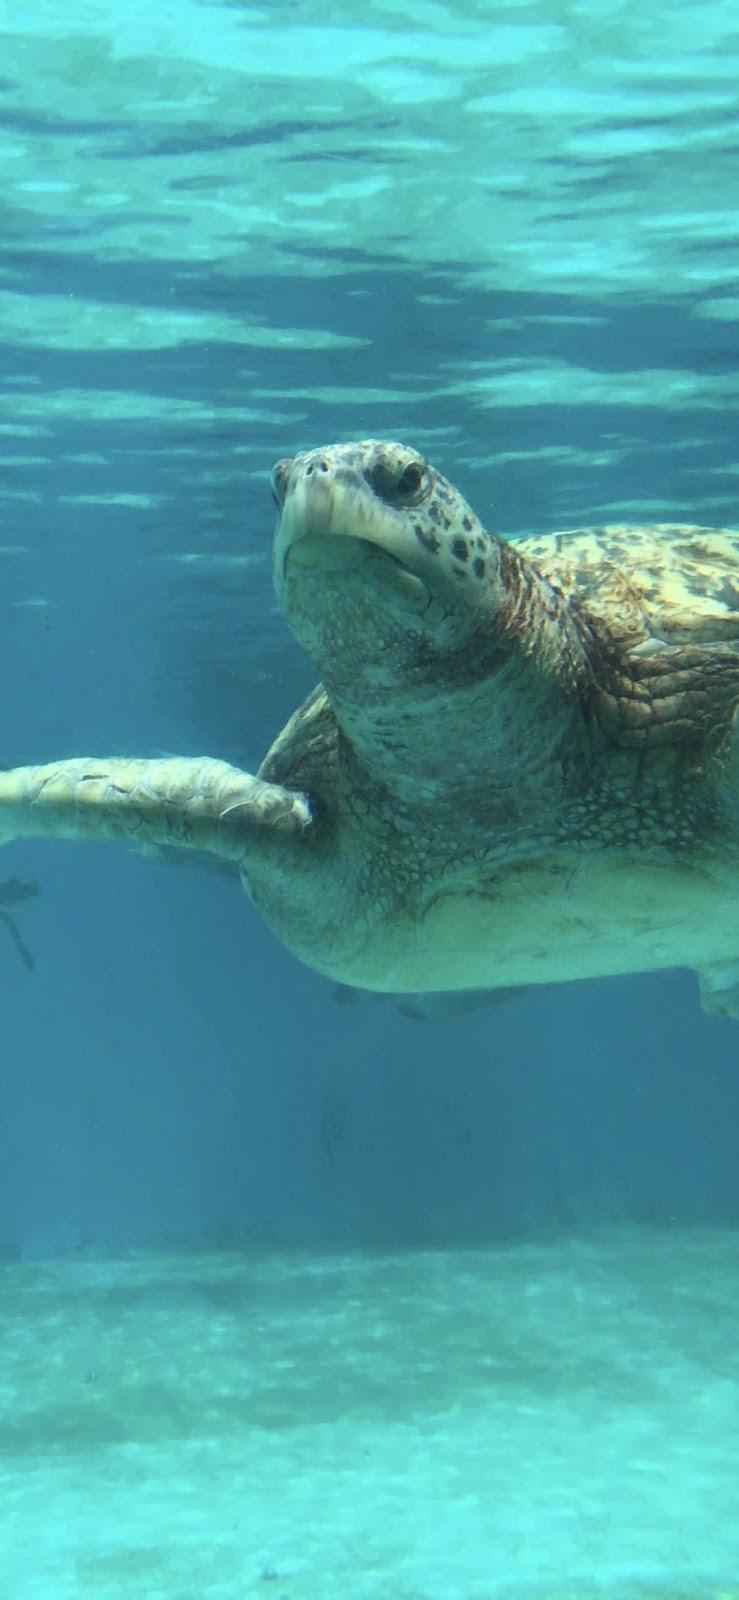 Wallpaper, sfondi iPhone, oceano, tartaruga, acqua